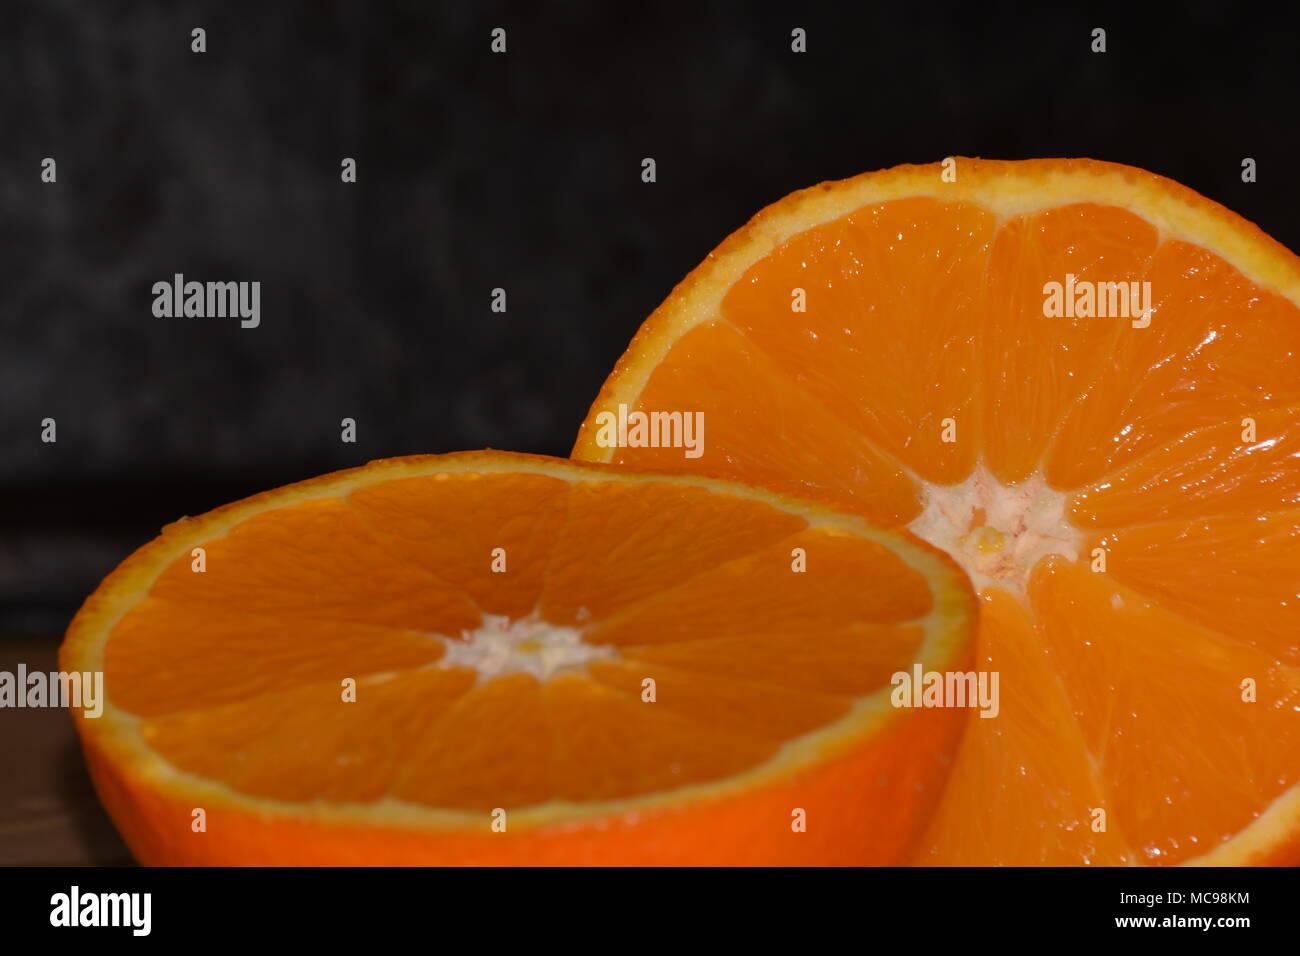 Two Juicy Oranges Black Background - Stock Image